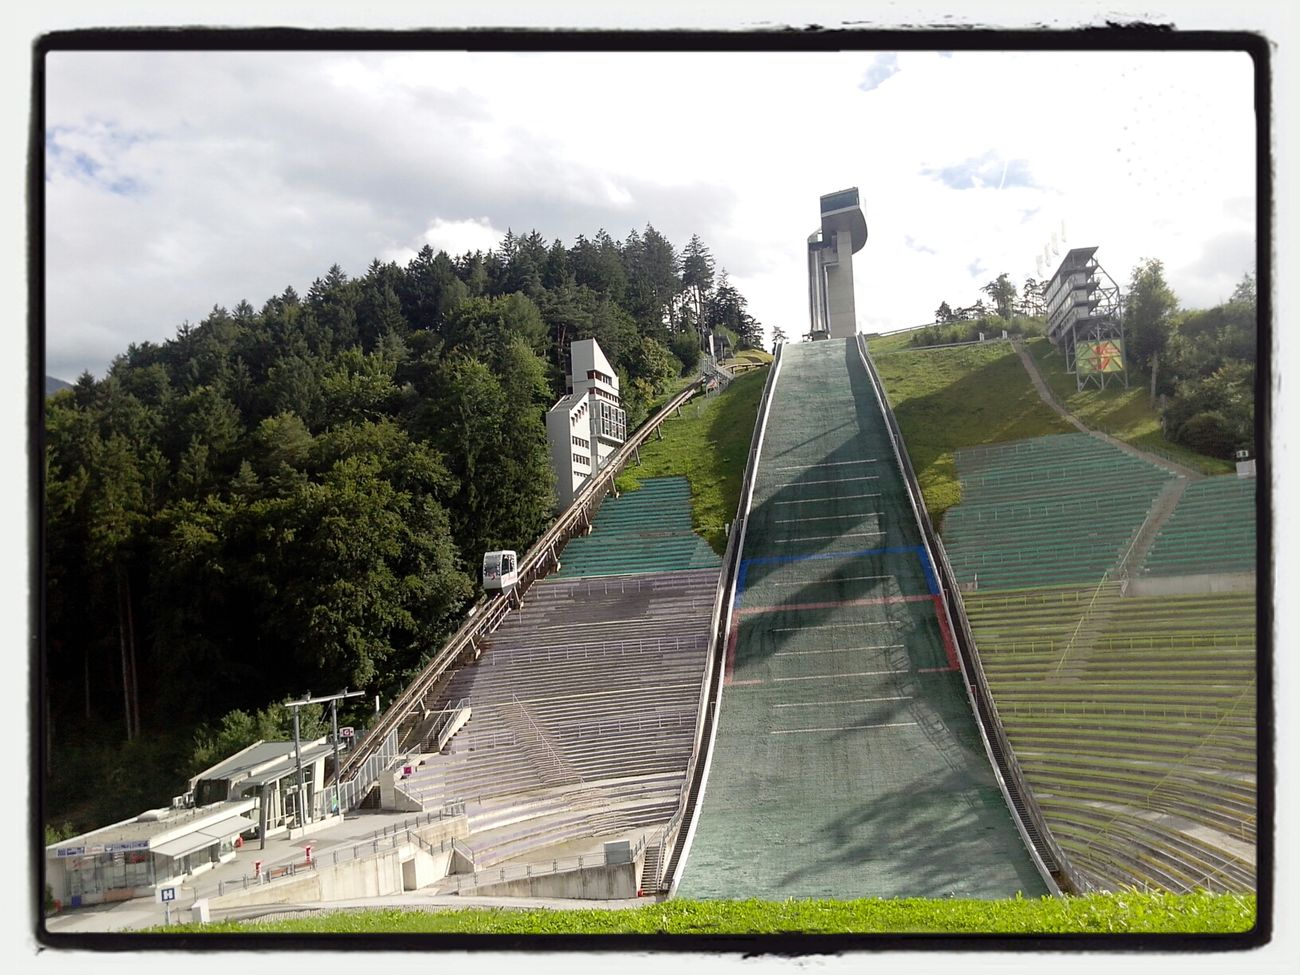 Eyeem Best Shots-architecture Innsbruck Olympiaschanze Bergisel